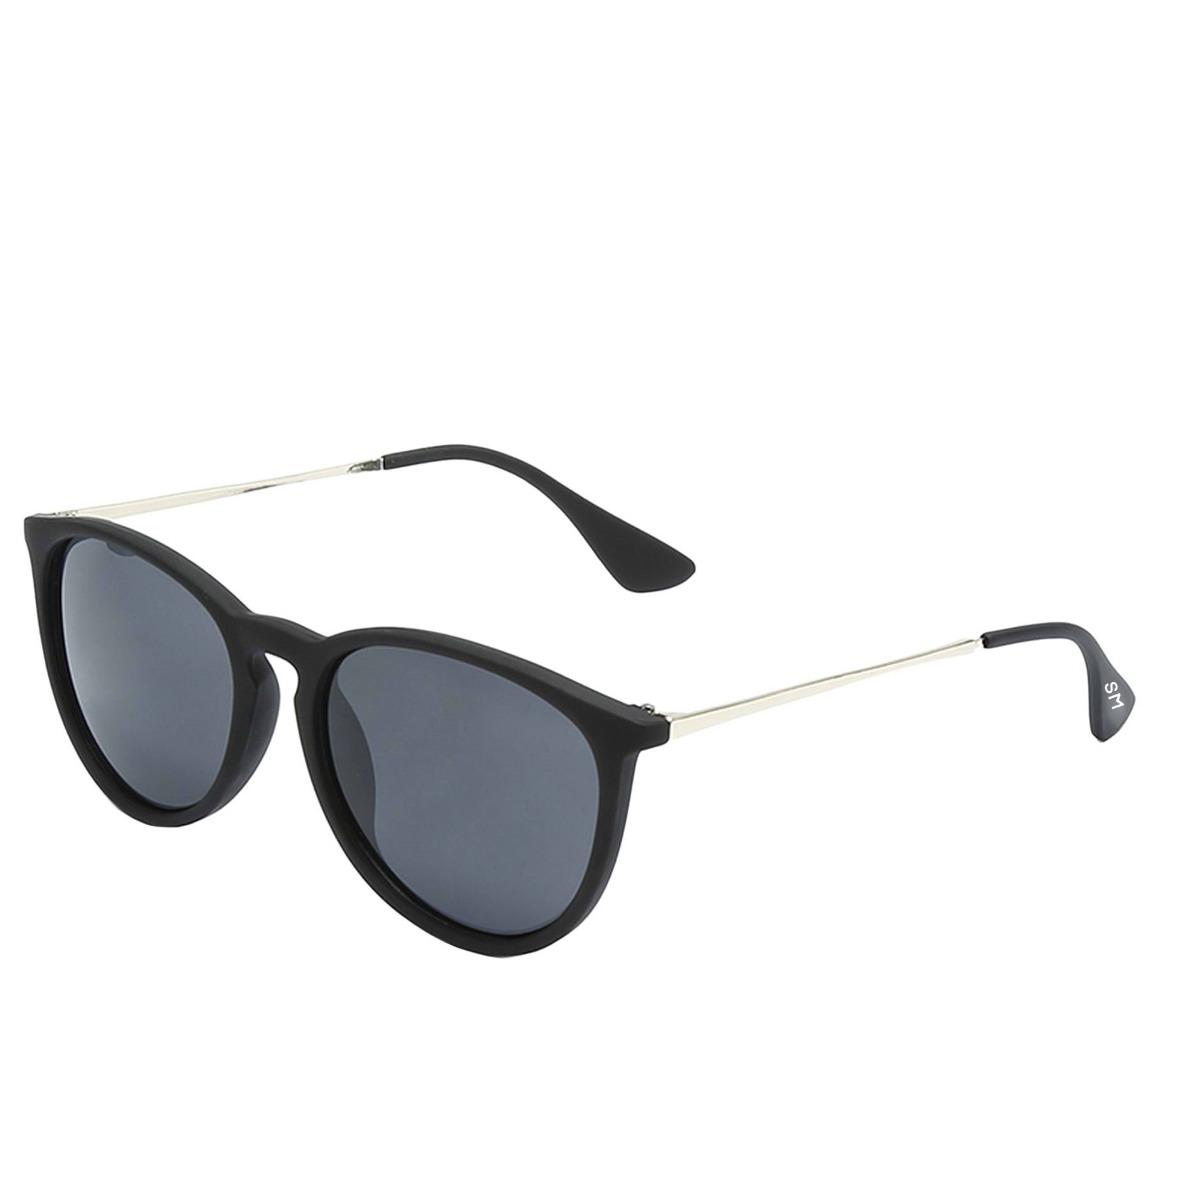 Óculos De Sol Masculino Sandro Moscoloni Raul Preto - R  159,90 em ... 87d56e39cd